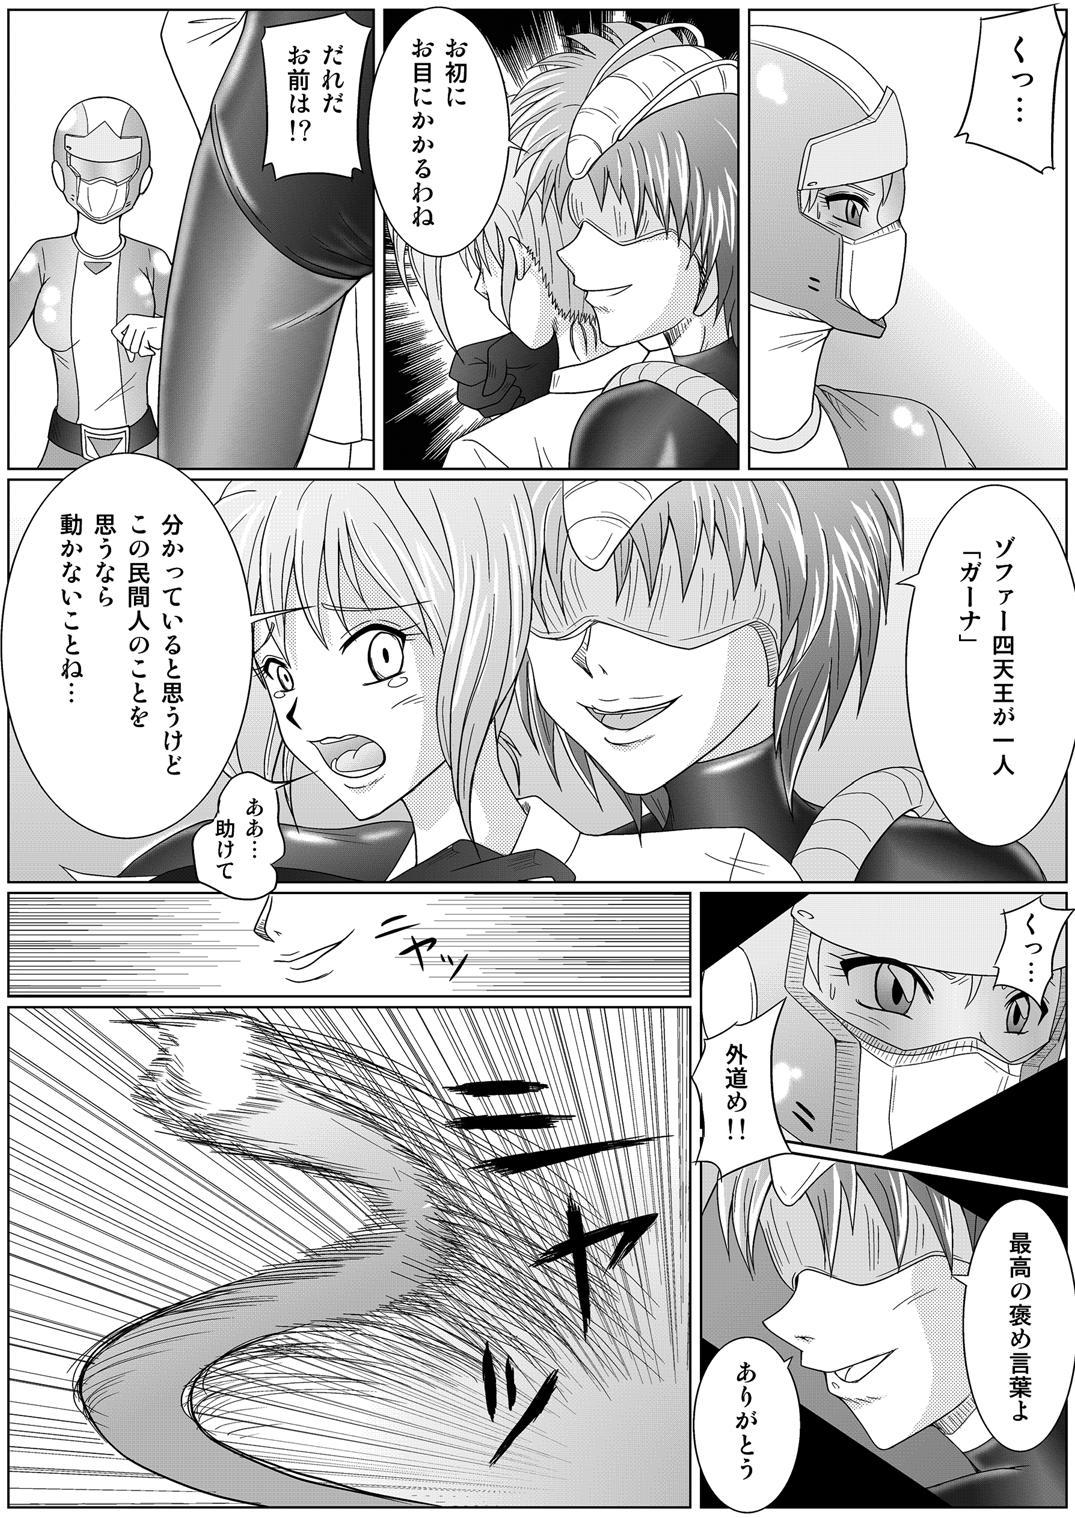 [Macxe's (monmon)] Tokubousentai Dinaranger ~Heroine Kairaku Sennou Keikaku~ Vol.01/02/03 (Renkaban) [Digital] 15